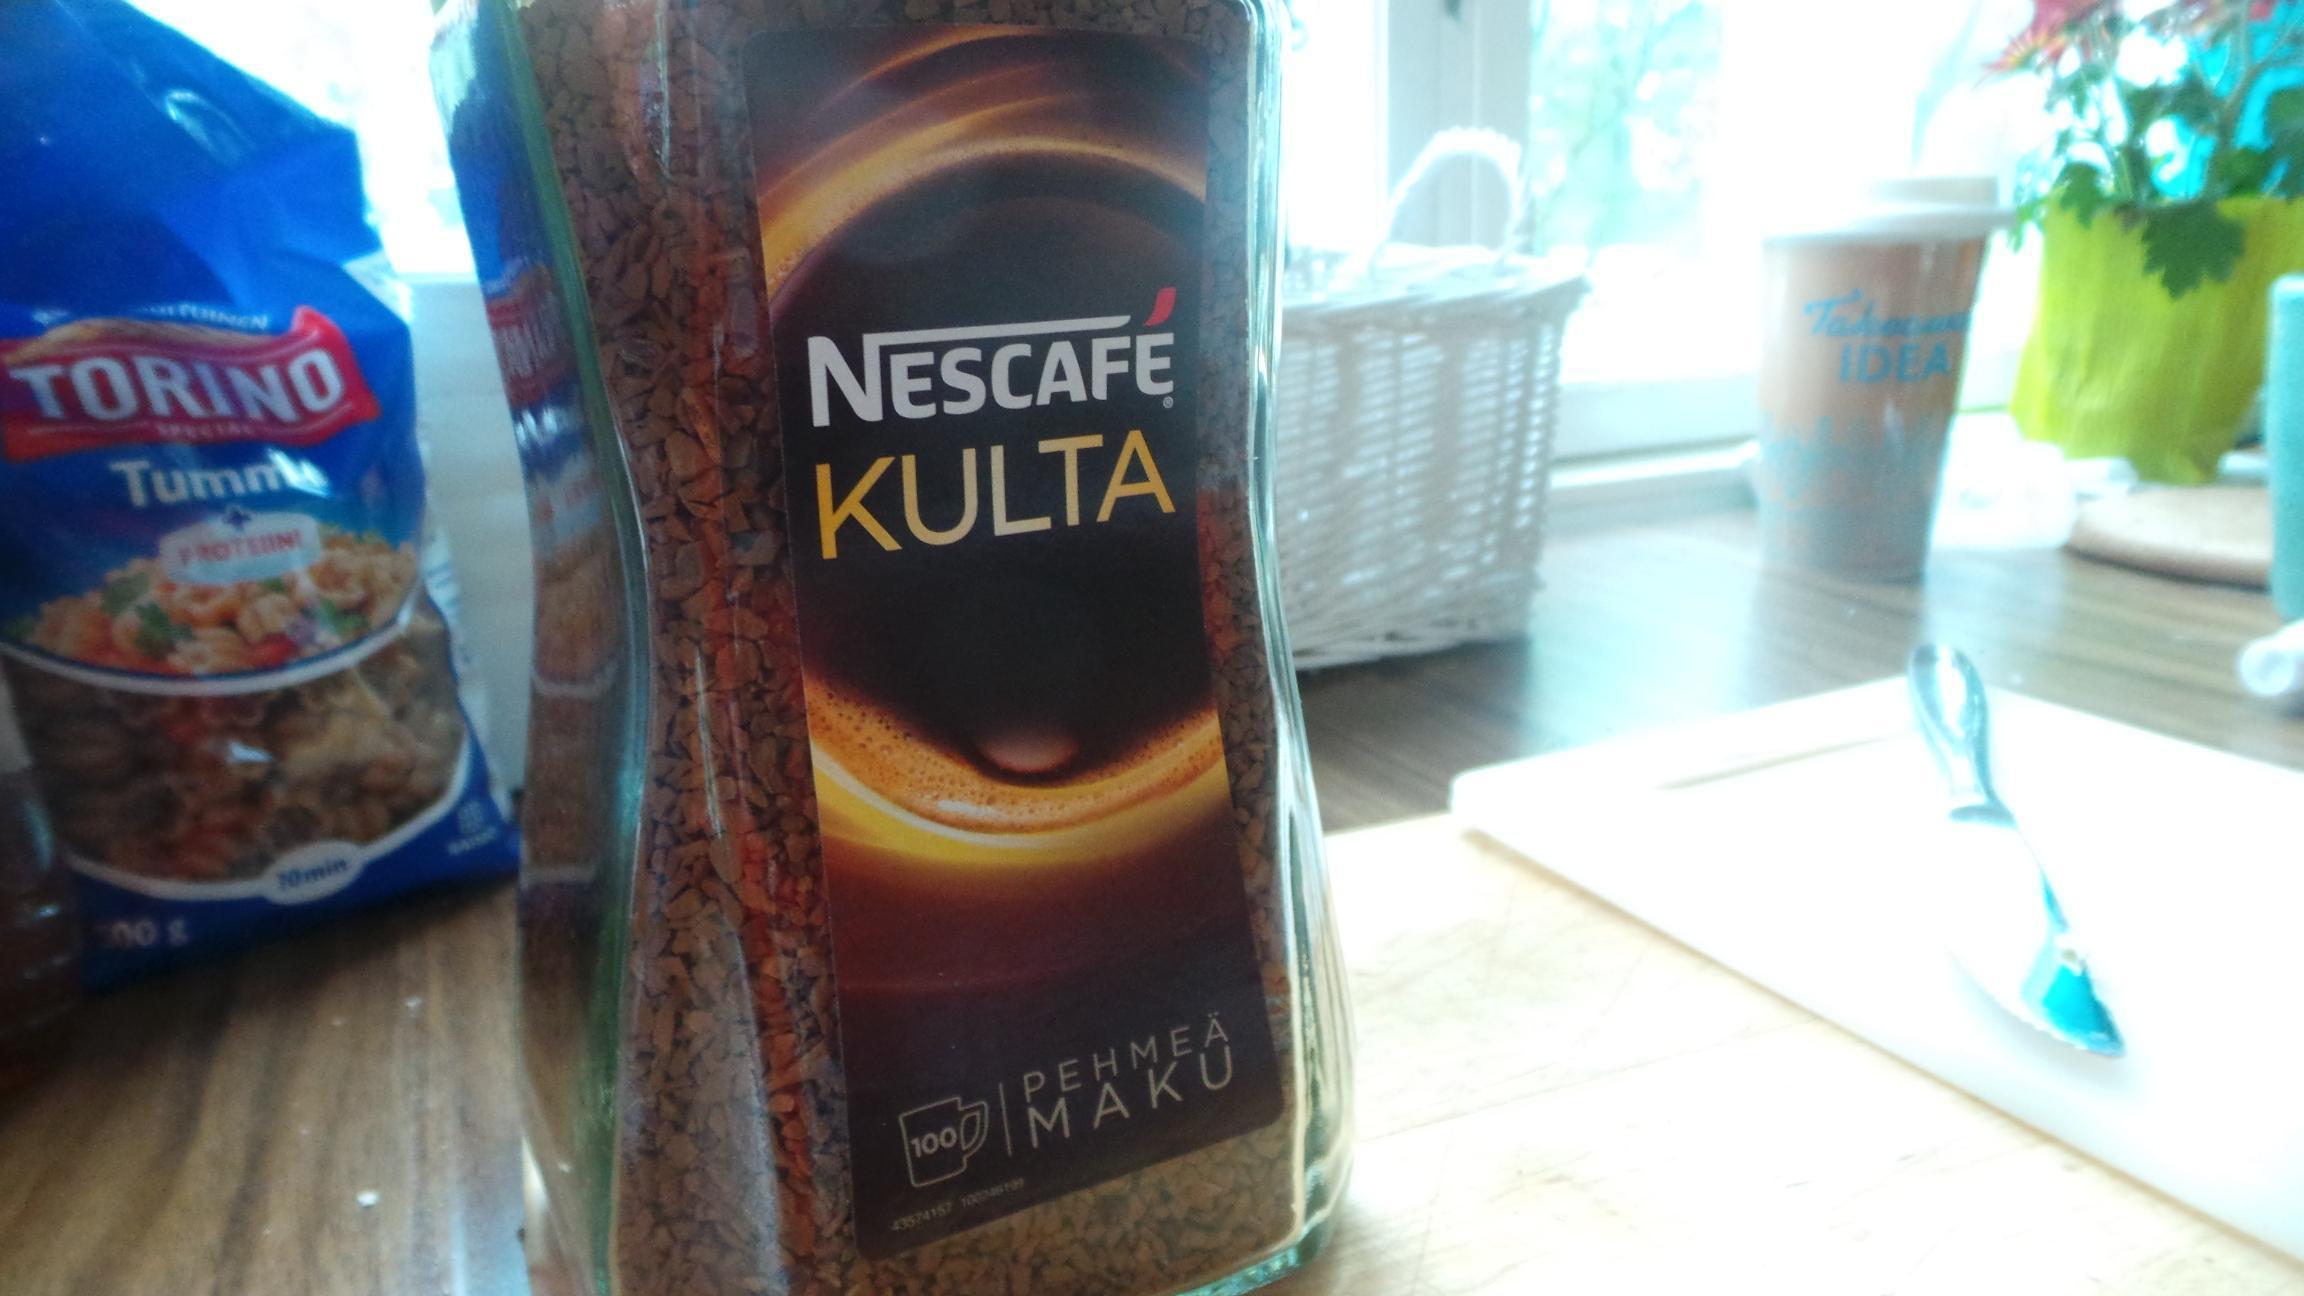 kofeiiniton kahvi ja raskausdiabetes